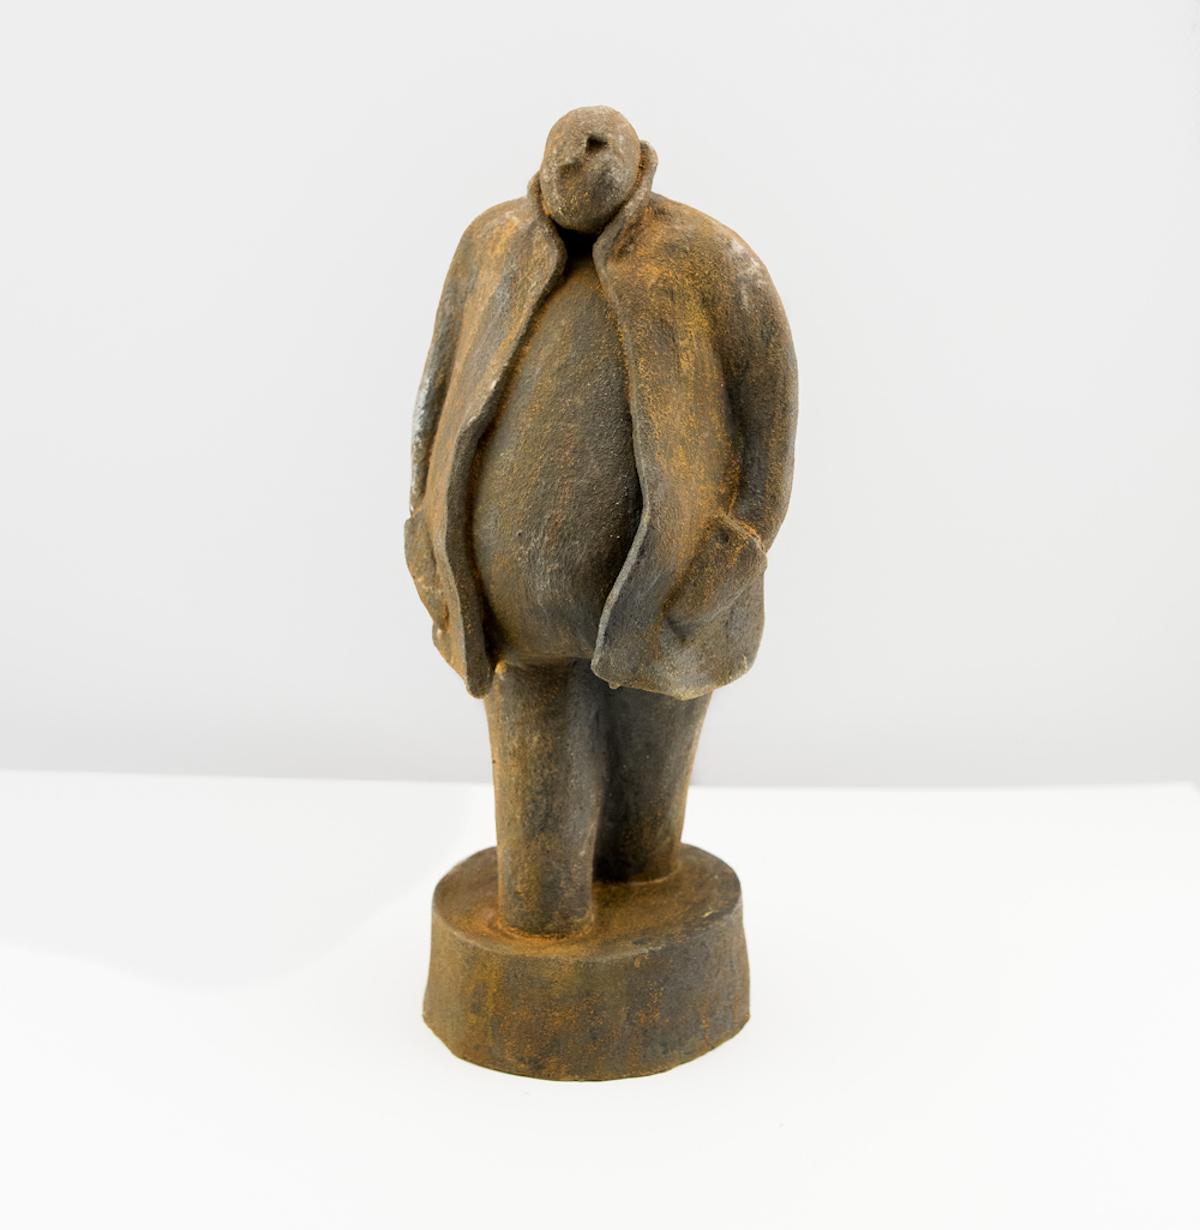 Lars-Lennart Stenberg Skulptur | Patinerat stengods  H30 x B15 x D13 cm 4 000 kr